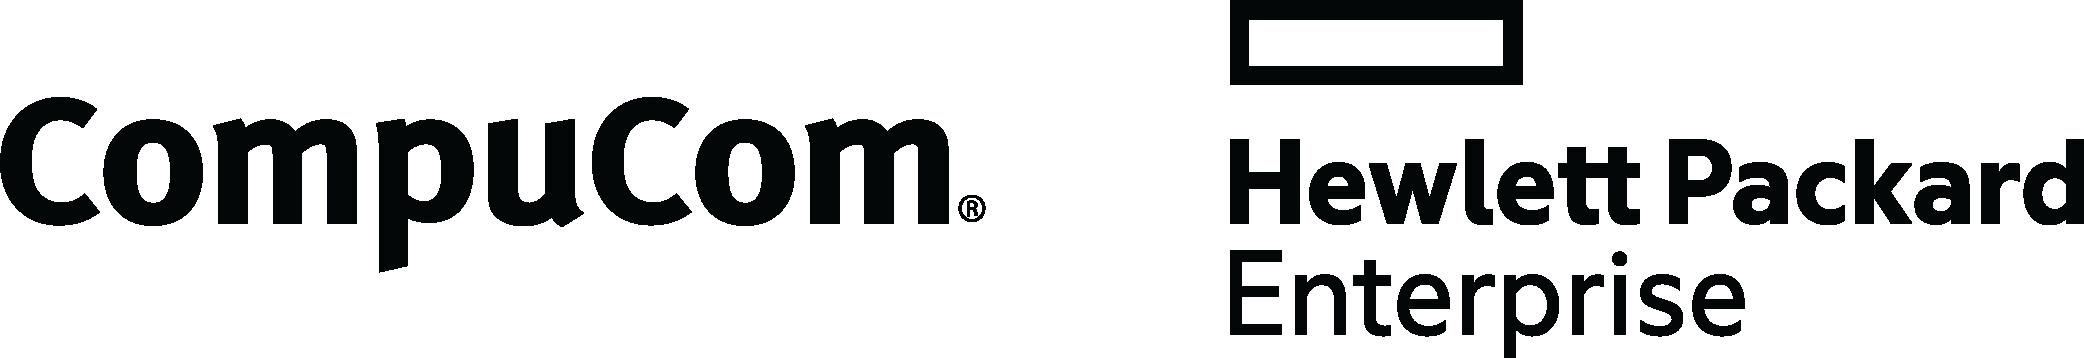 logo new-1